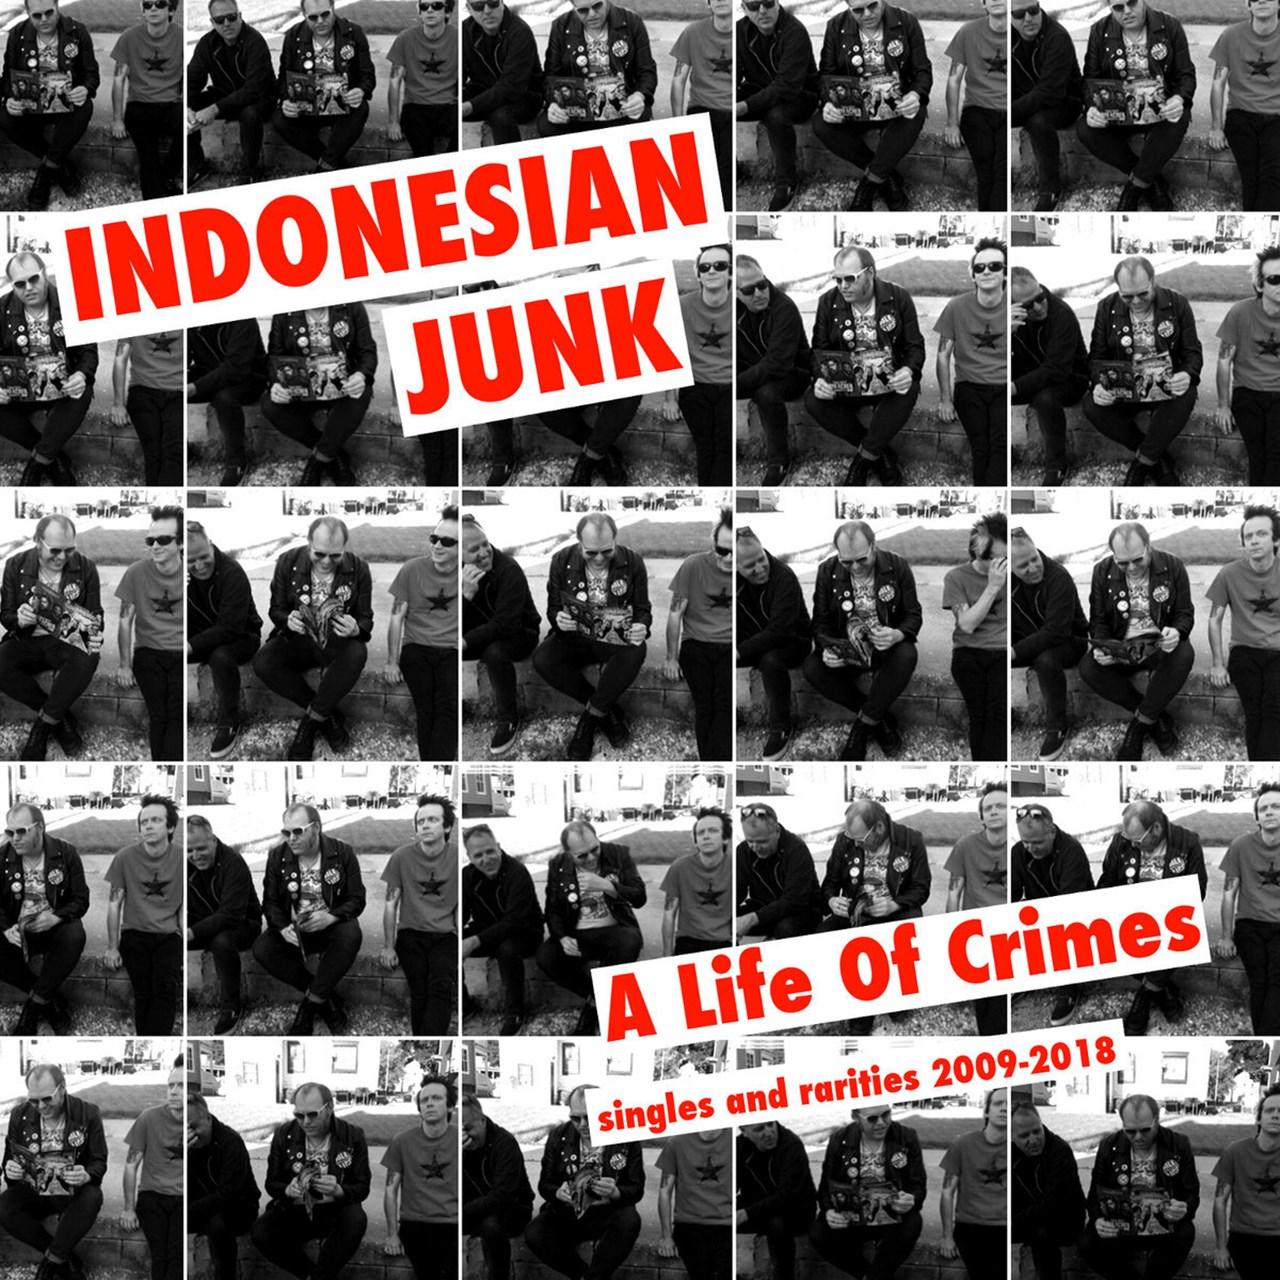 A Life of Crimes: Singles and Rarities 2009-2018 - 1